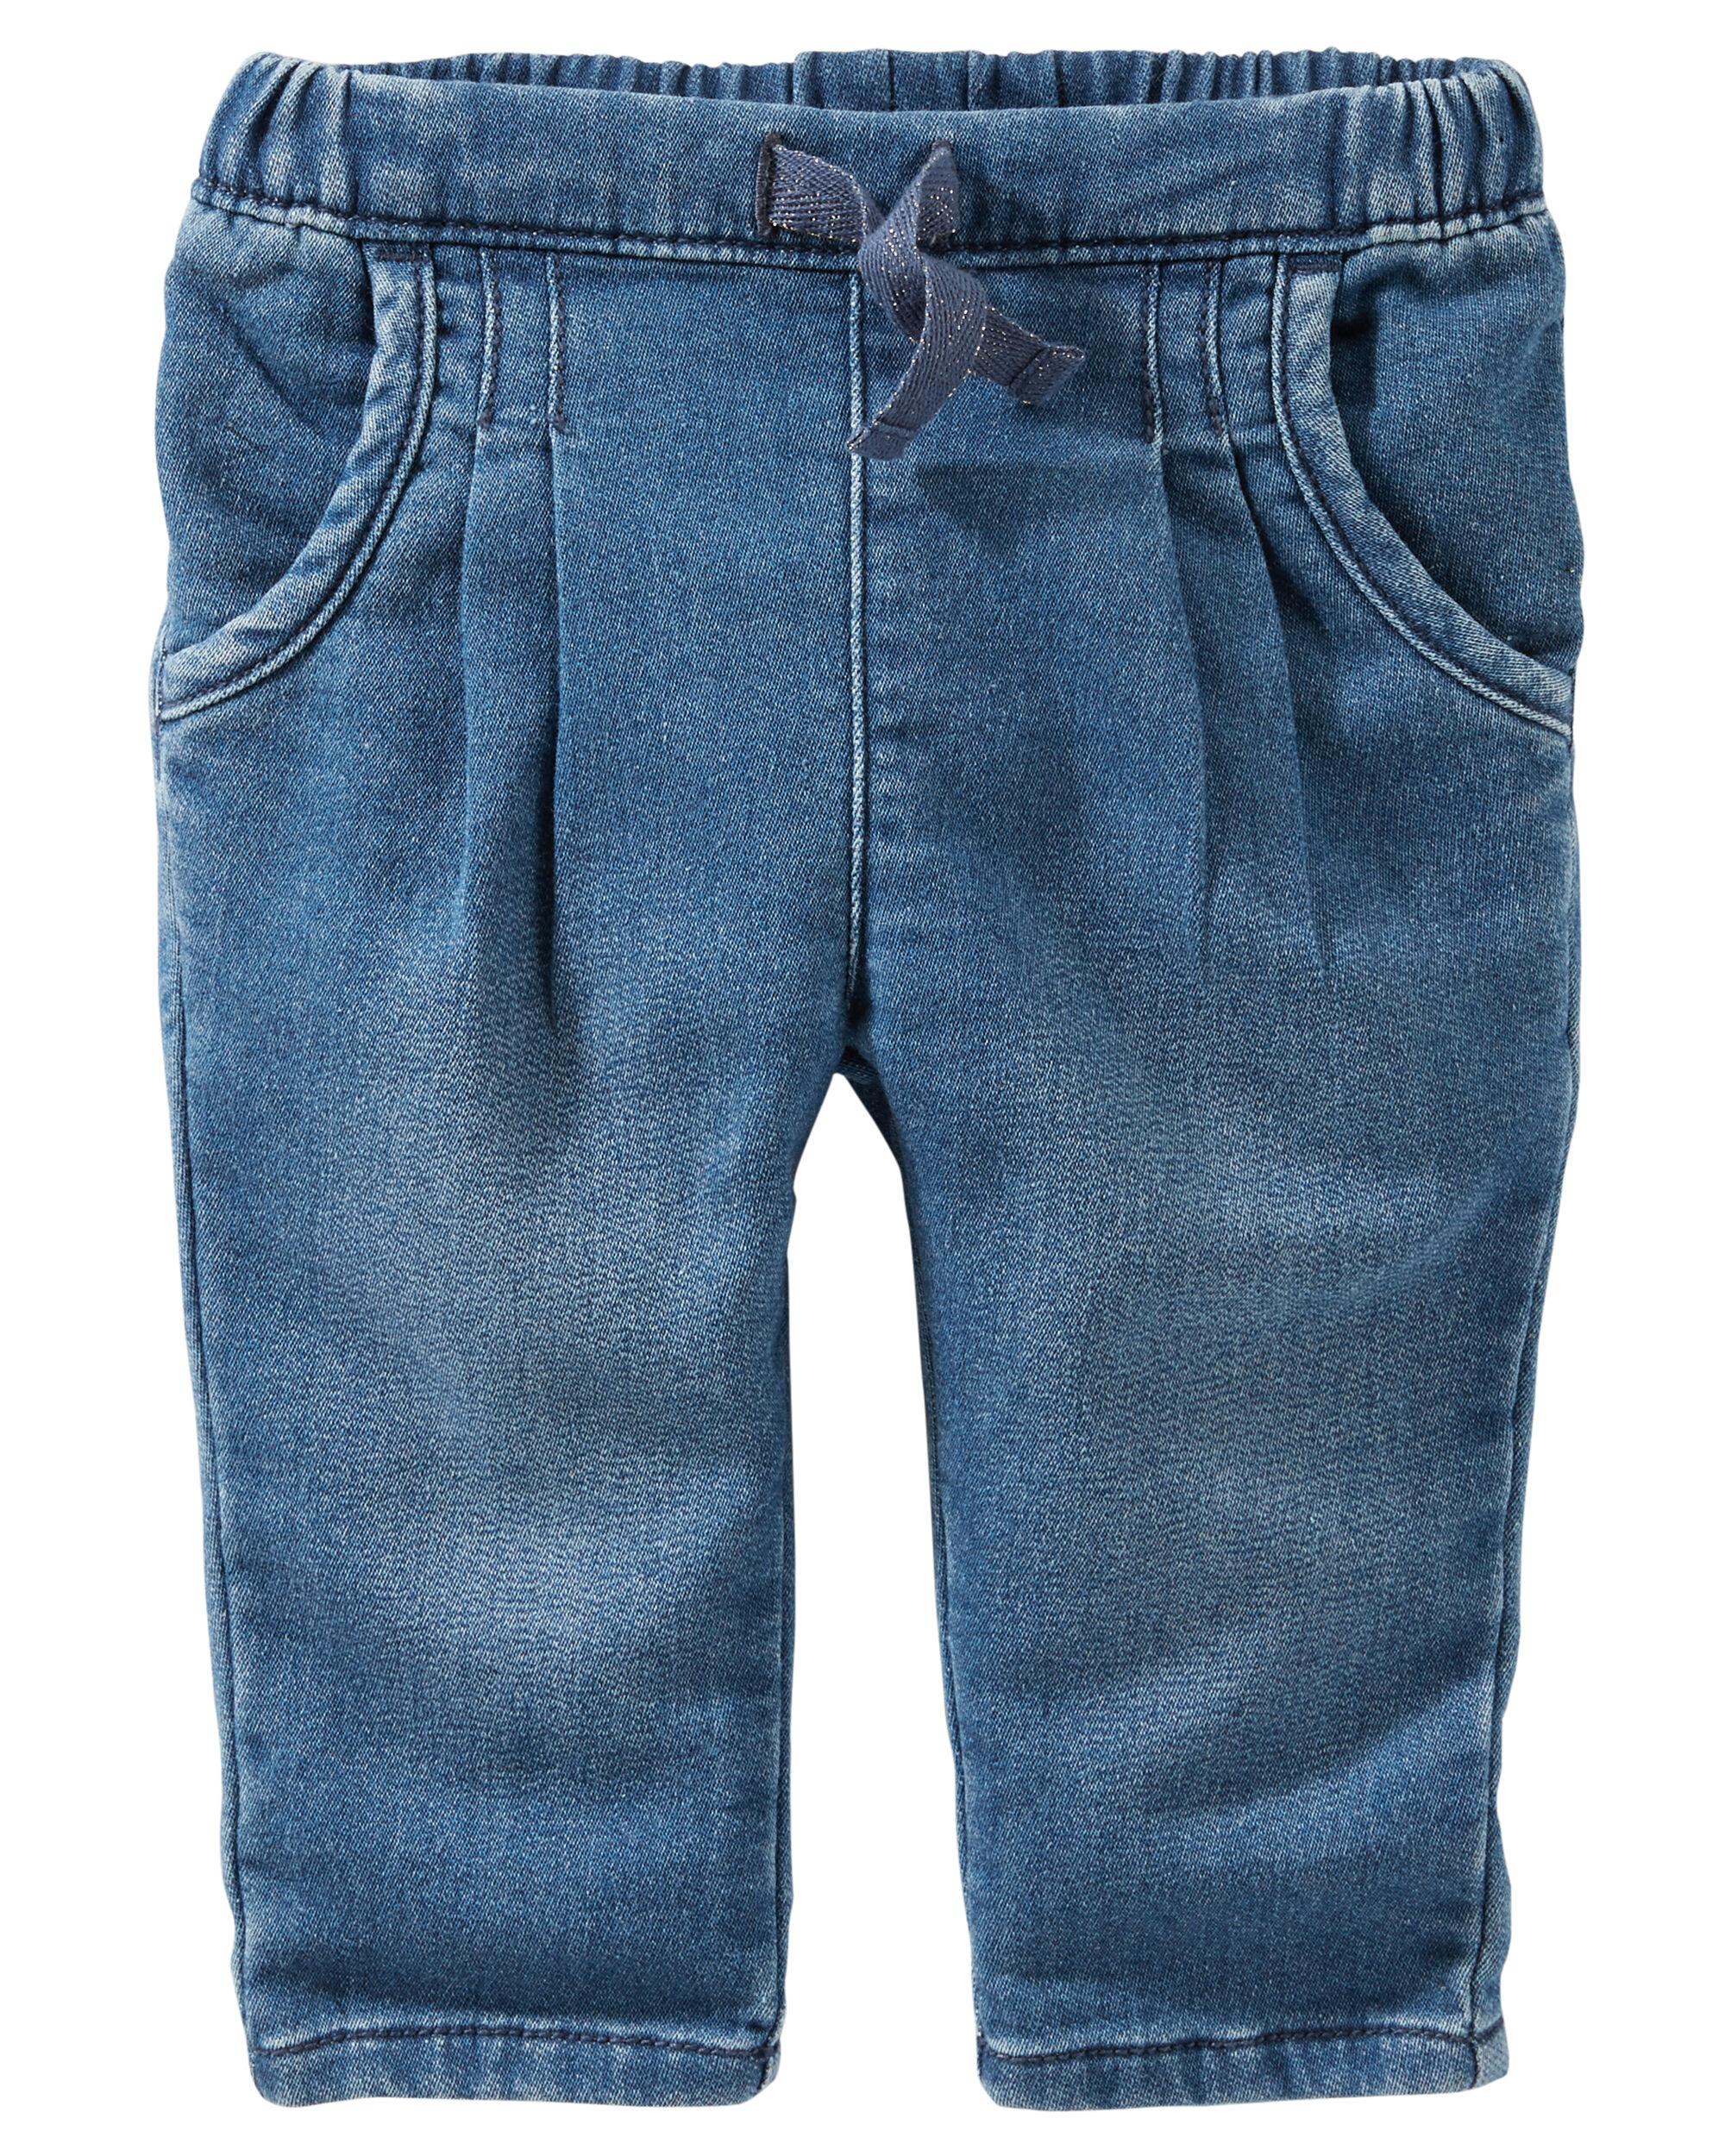 Pull-On Knit-like Denim Pants